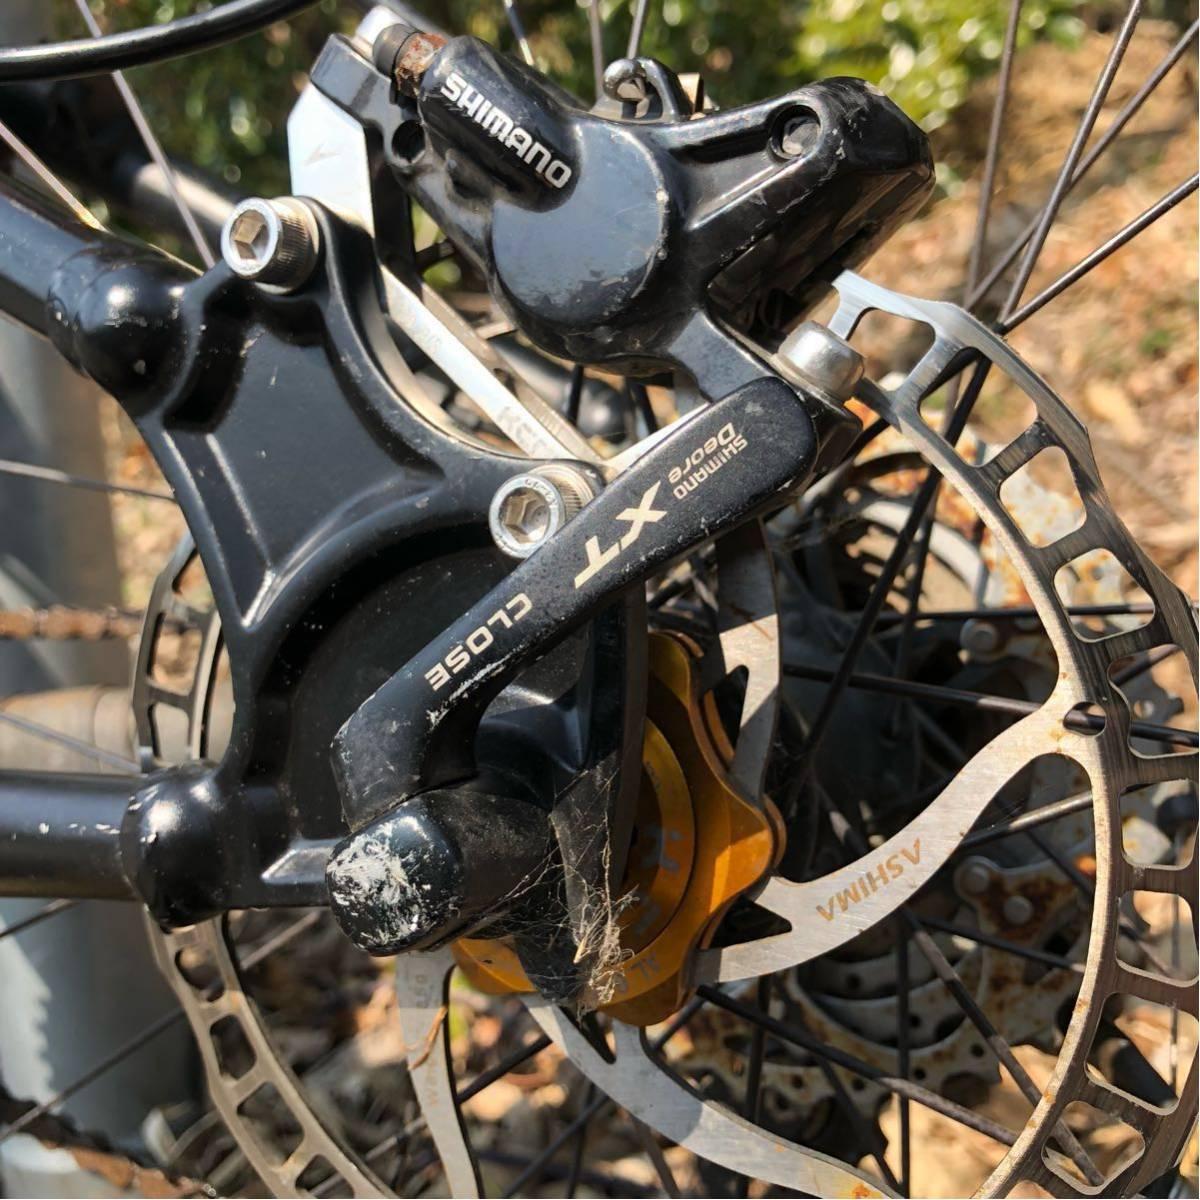 TREK GaryFisher MTB 改造多数 26 ストリート ダウンヒル トライアル BMX マウンテンバイク cannondale specialized fuji giant kona _画像6